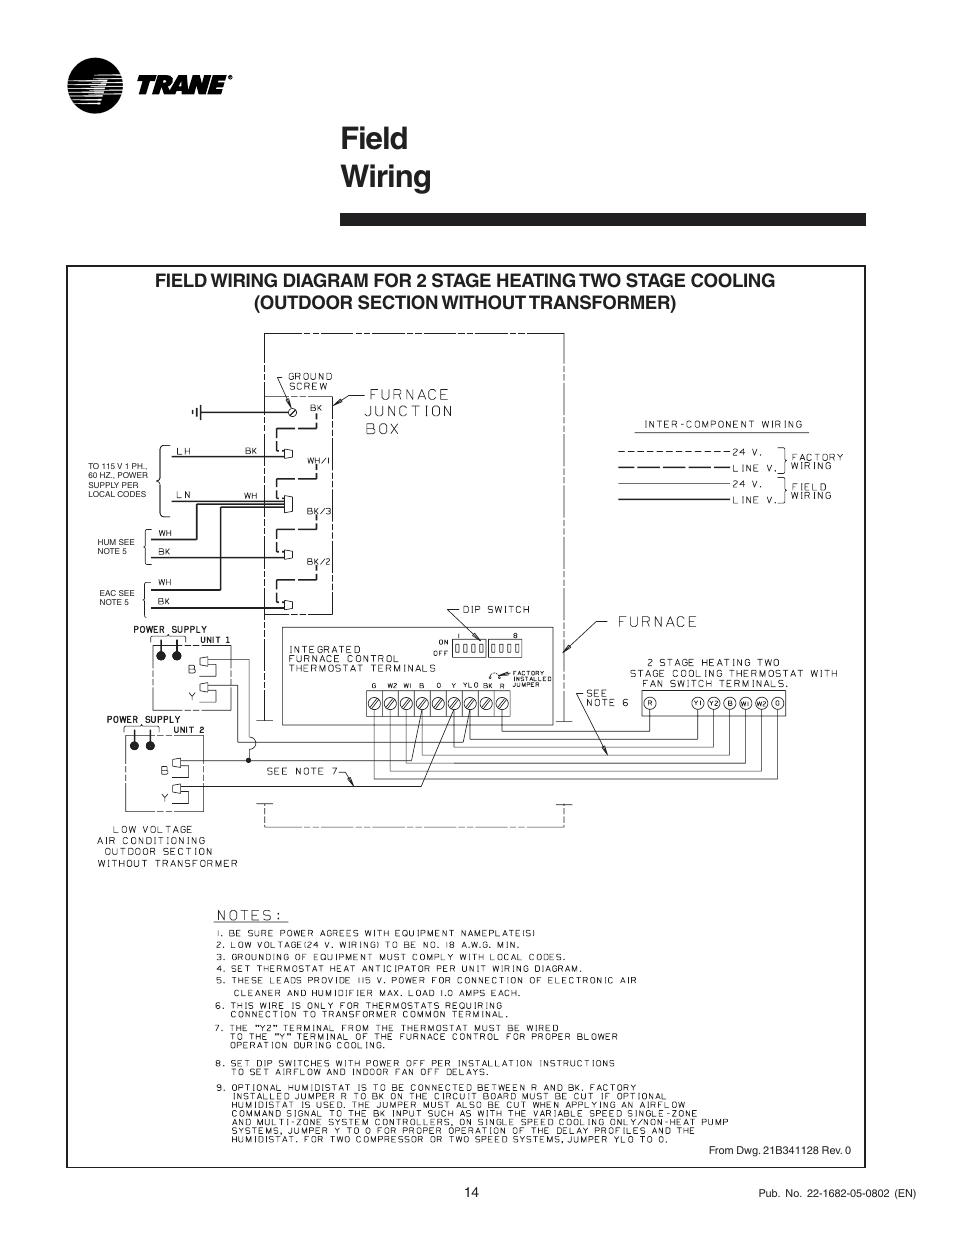 Field Wiring